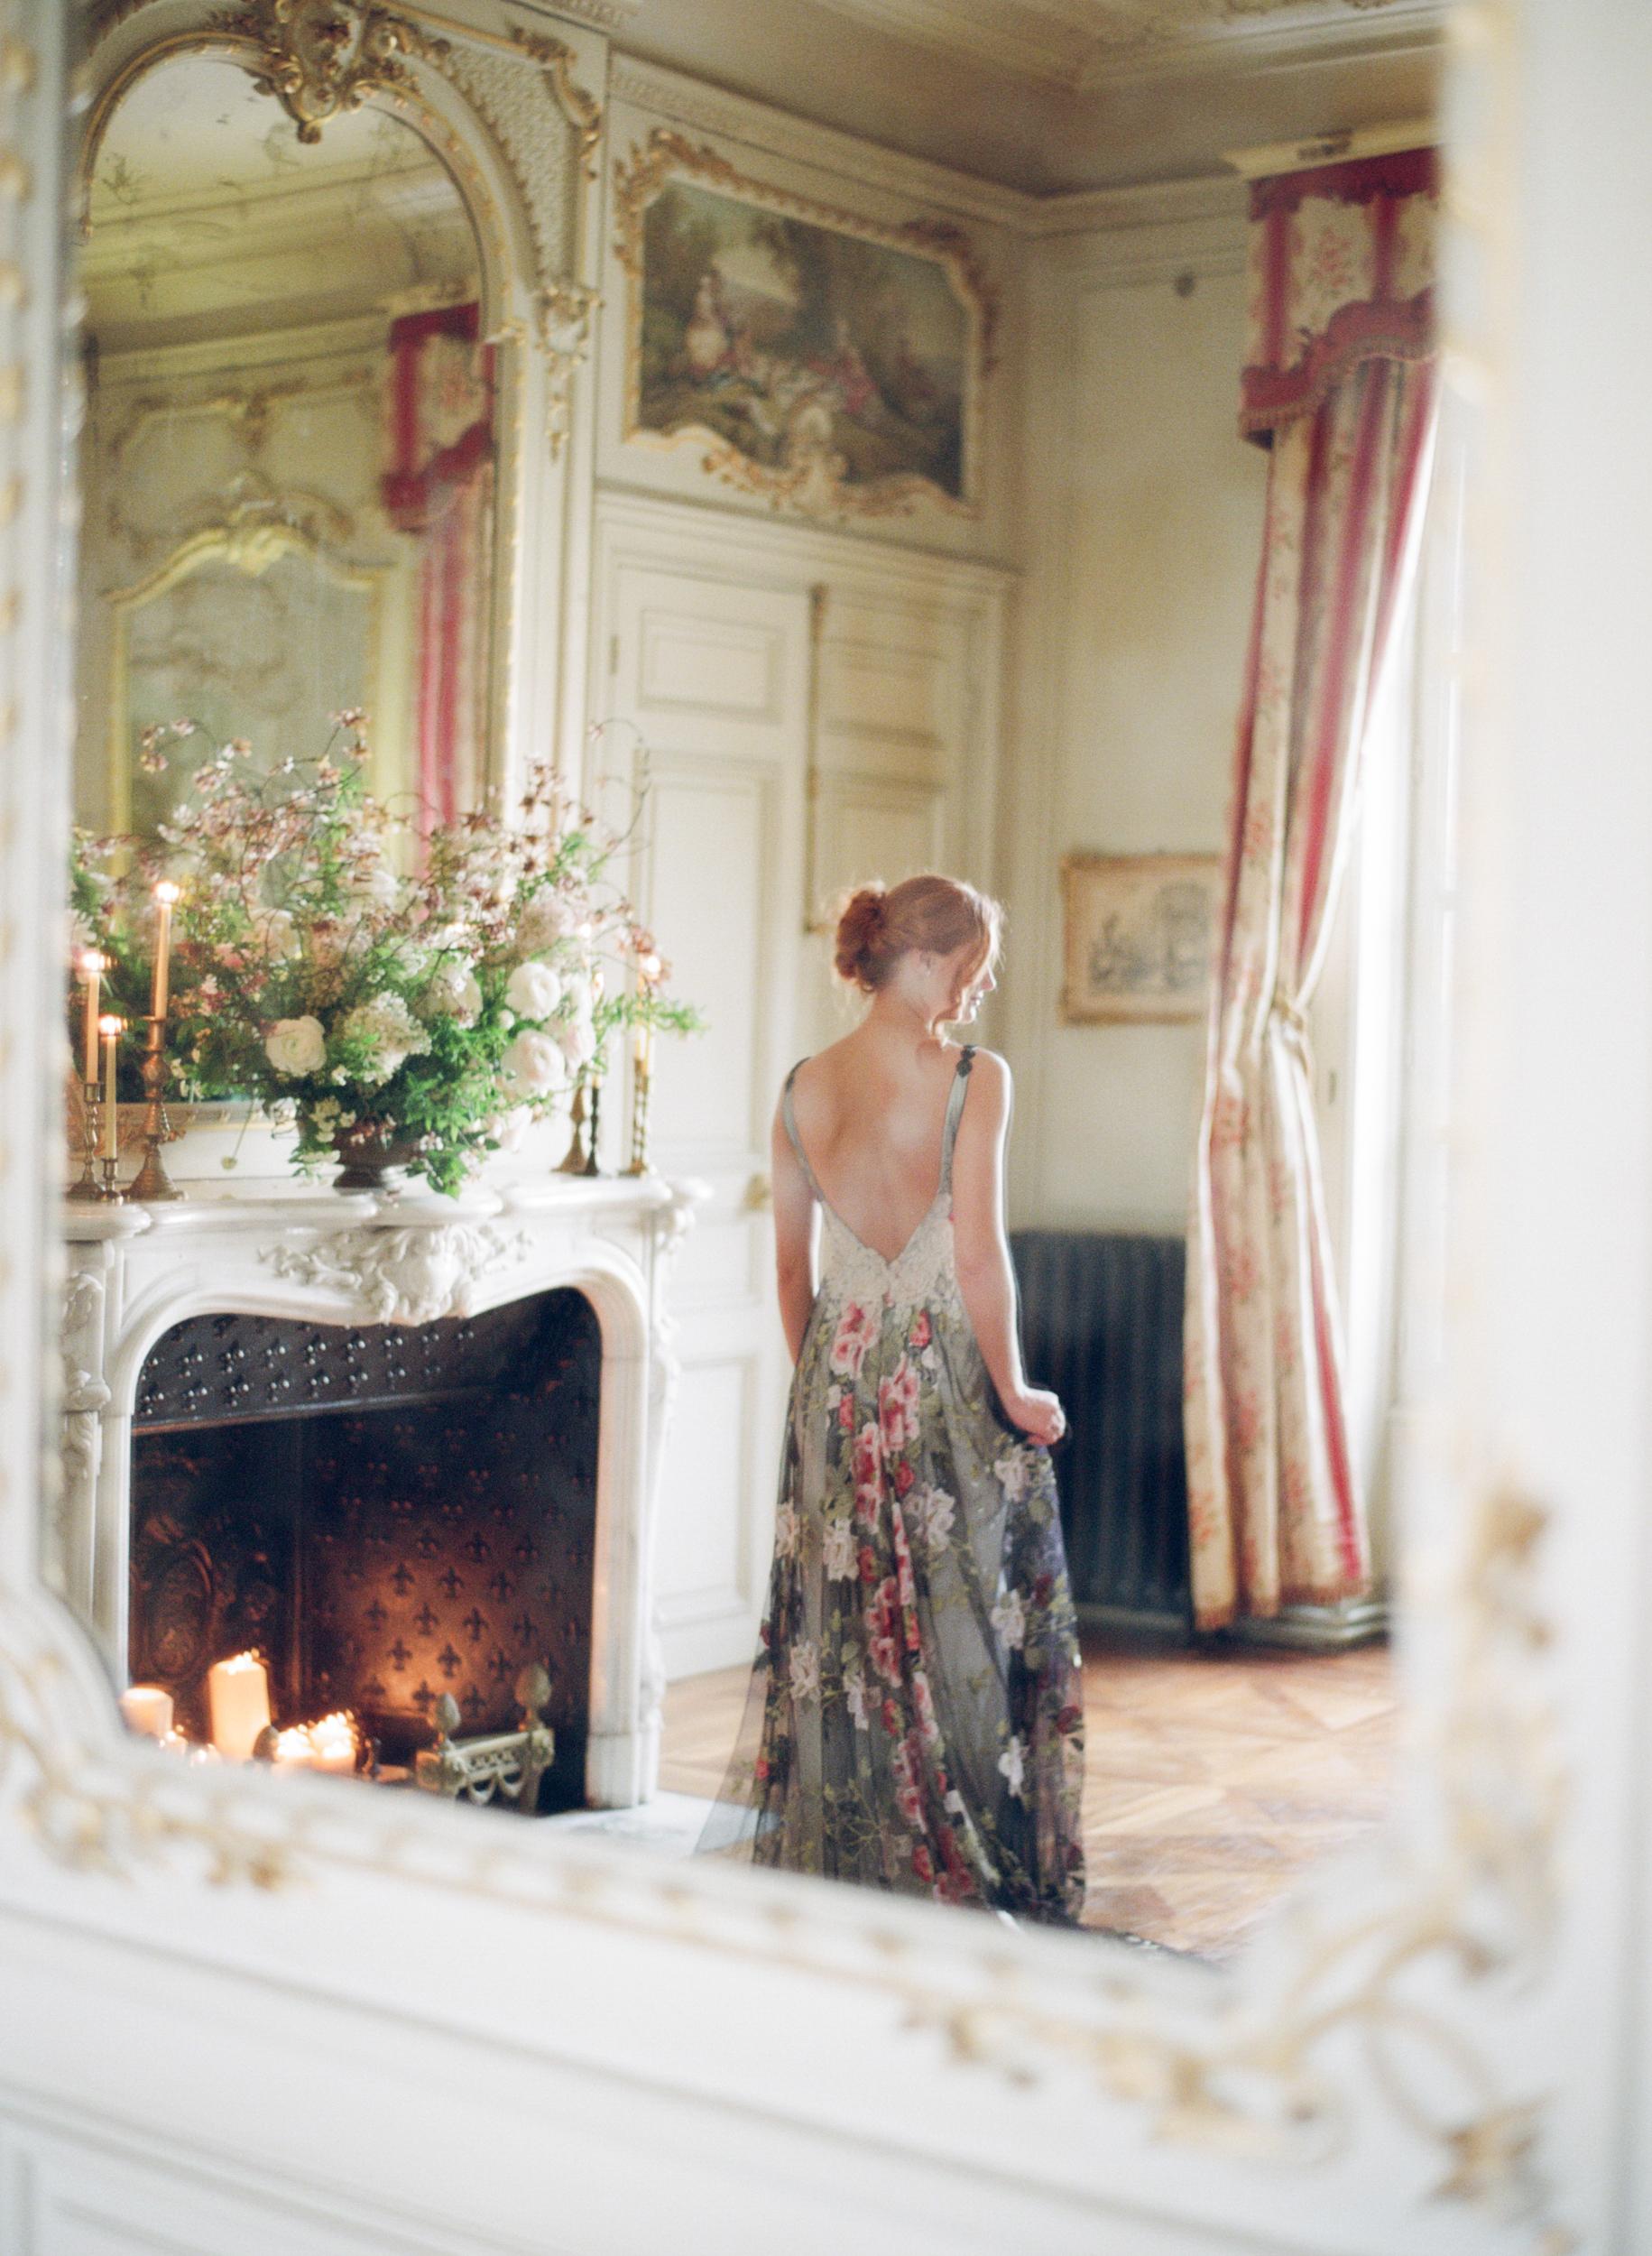 A bride in a mirror at Chateau de Varennes; Sylvie Gil Photography